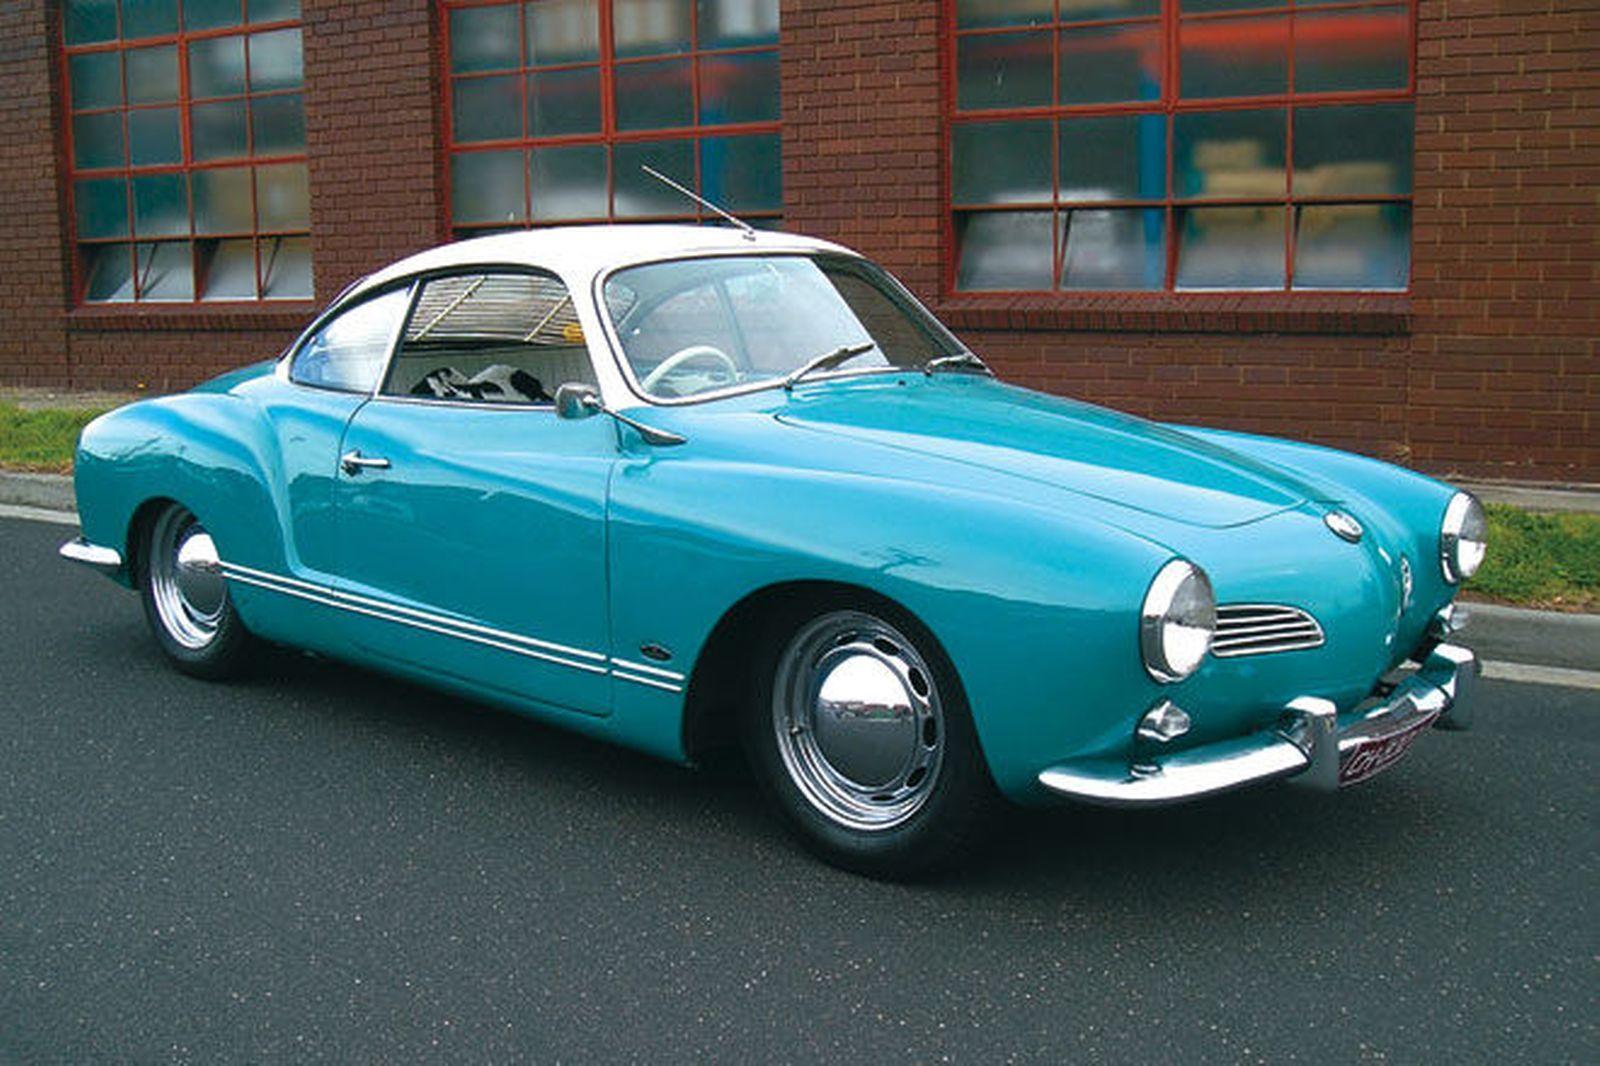 Volkswagen Karmann Ghia Coupe | coches del pasado | Pinterest ...